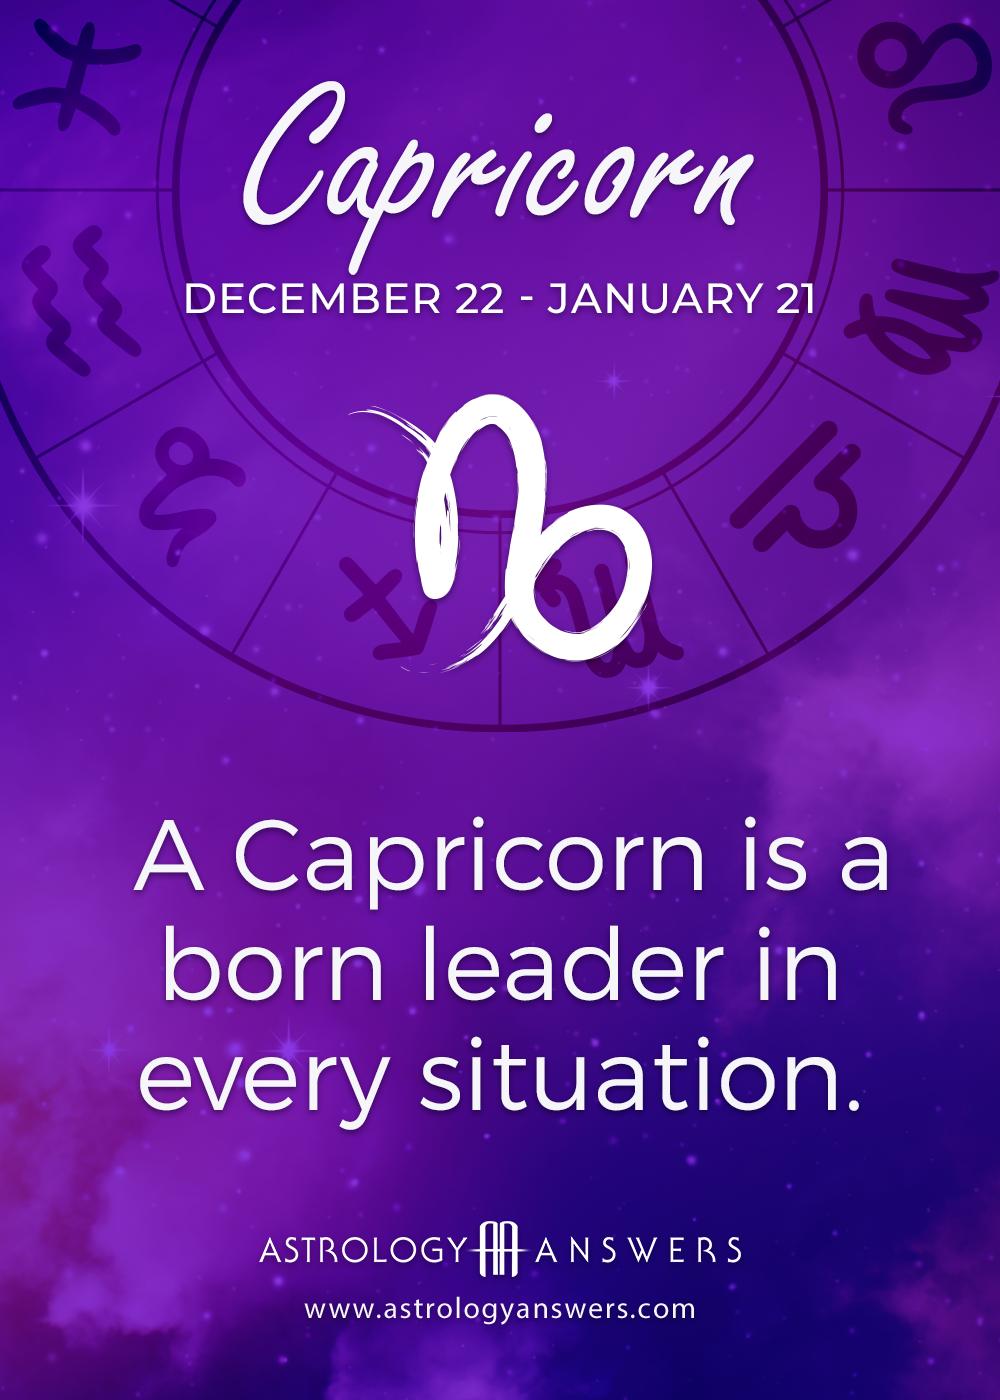 Capricorn astrology